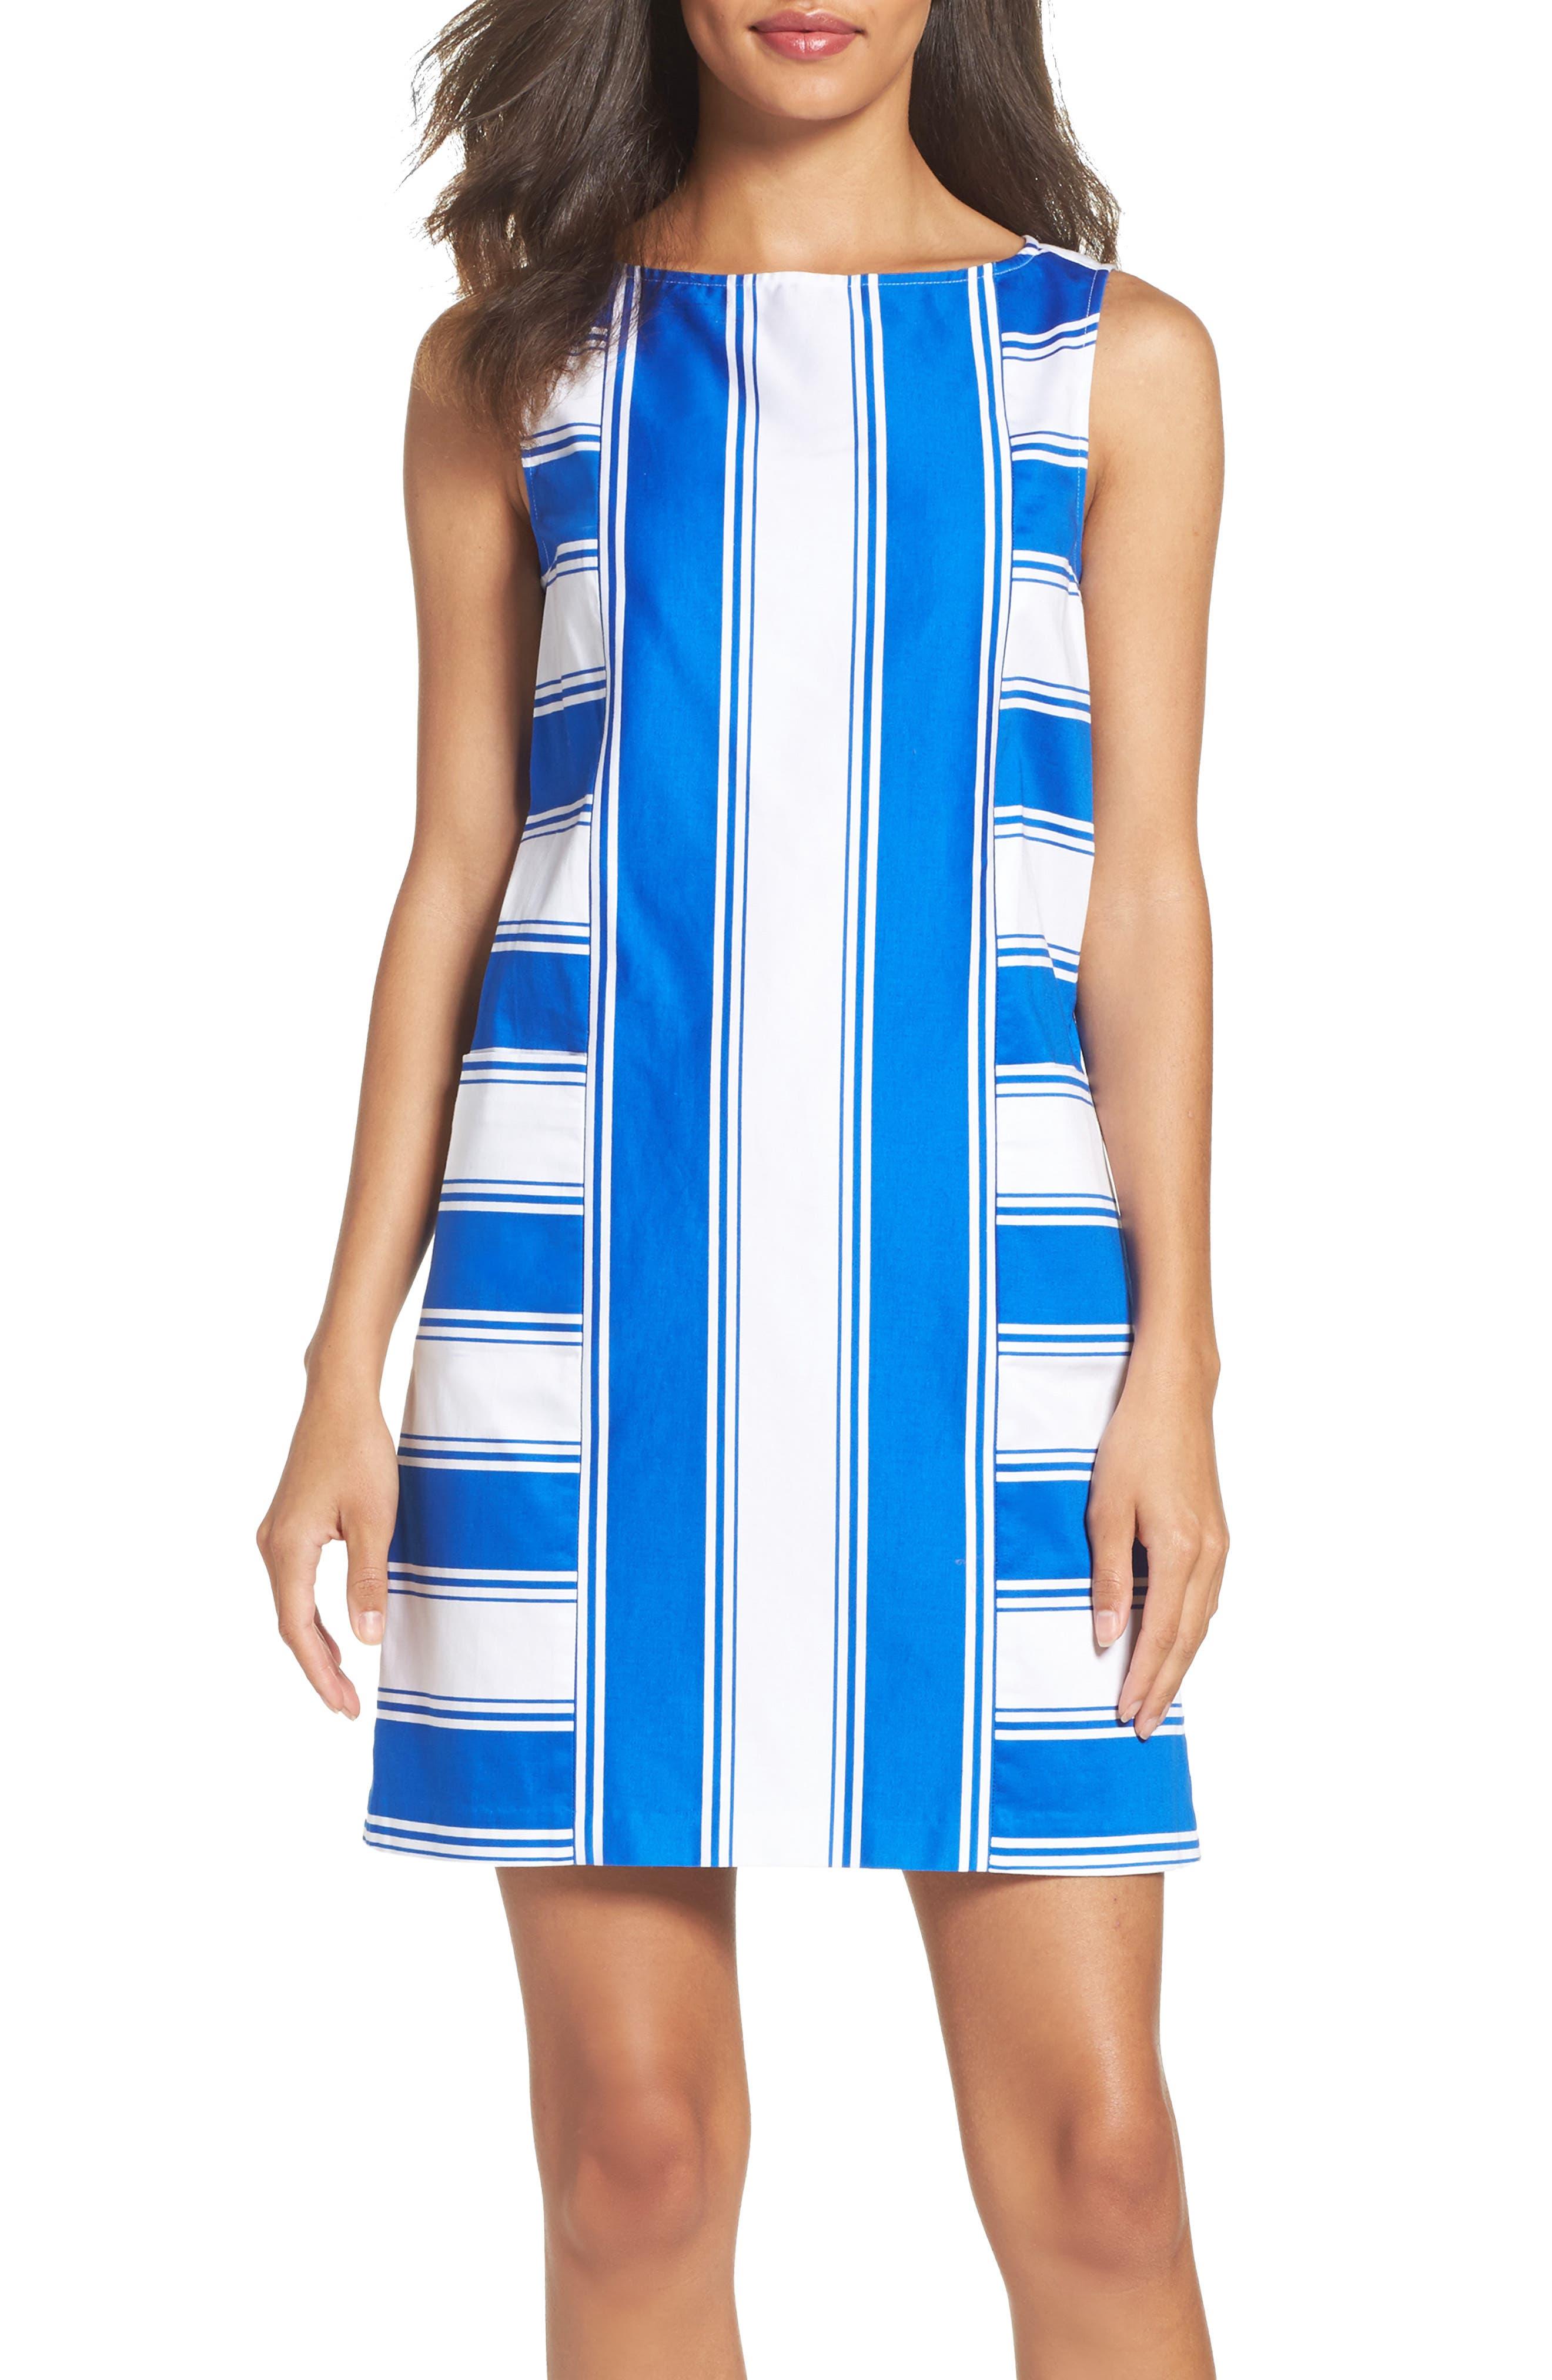 Adrianna Papell Stretch Cotton Shift Dress